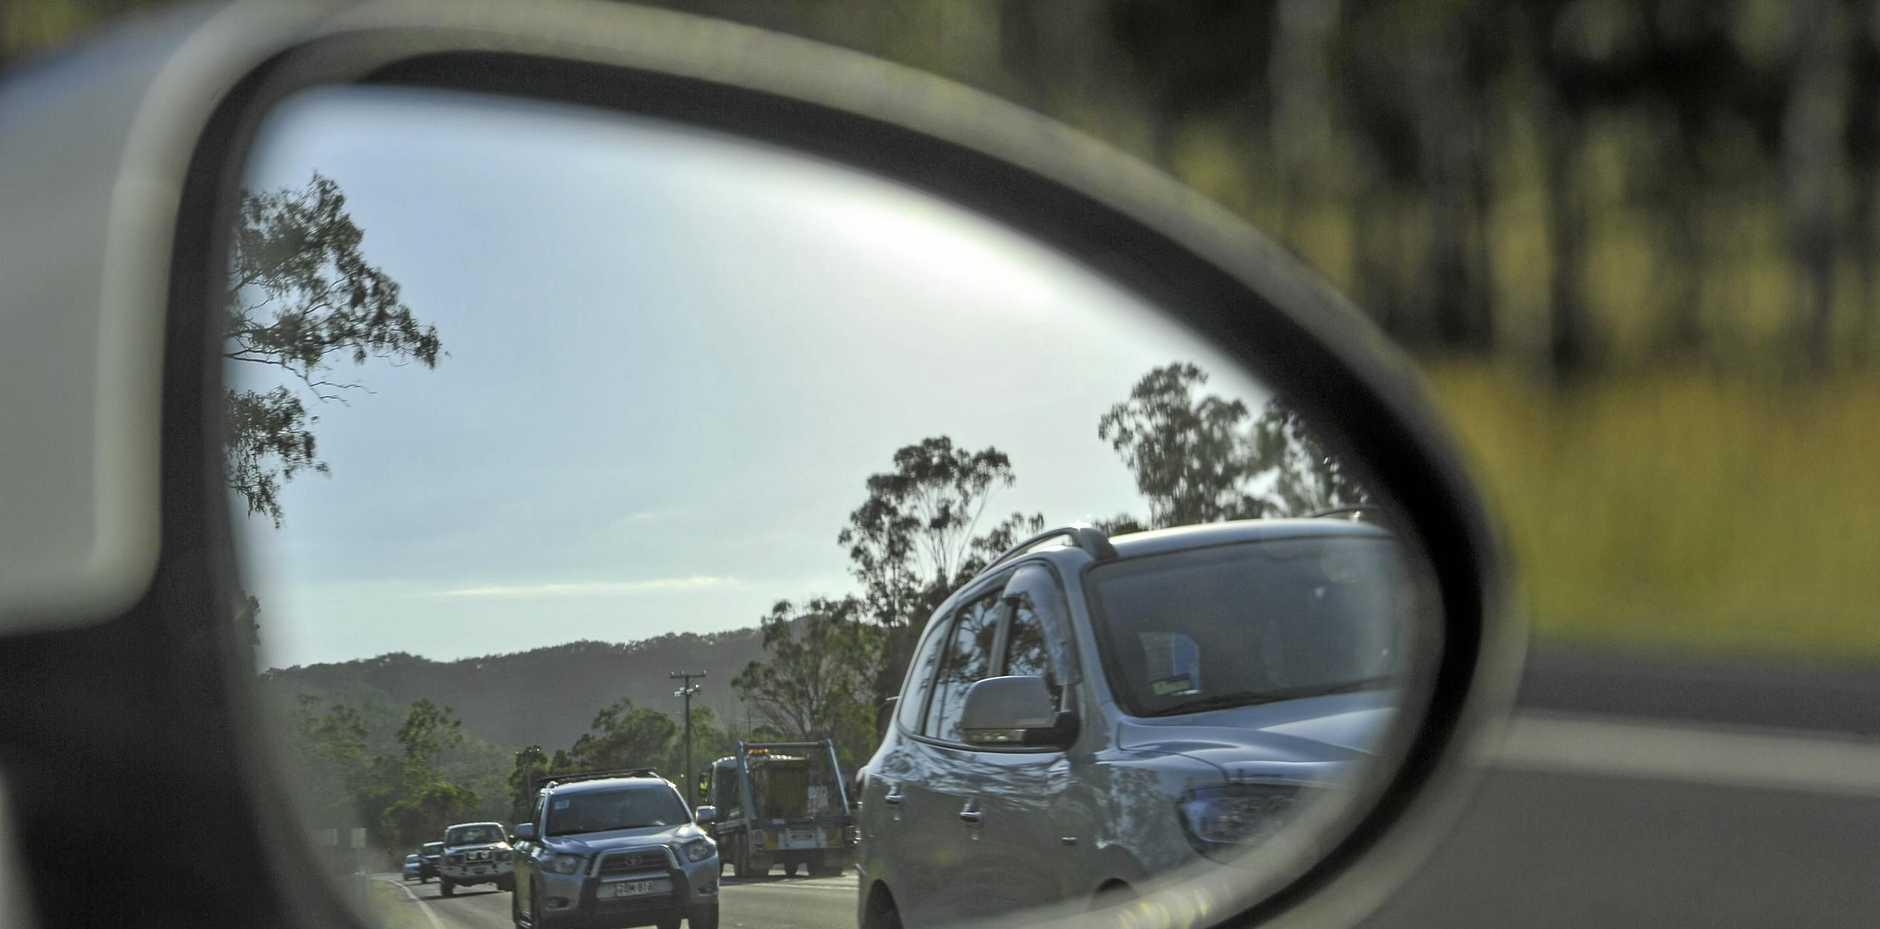 FILE PHOTO: Traffic on road.